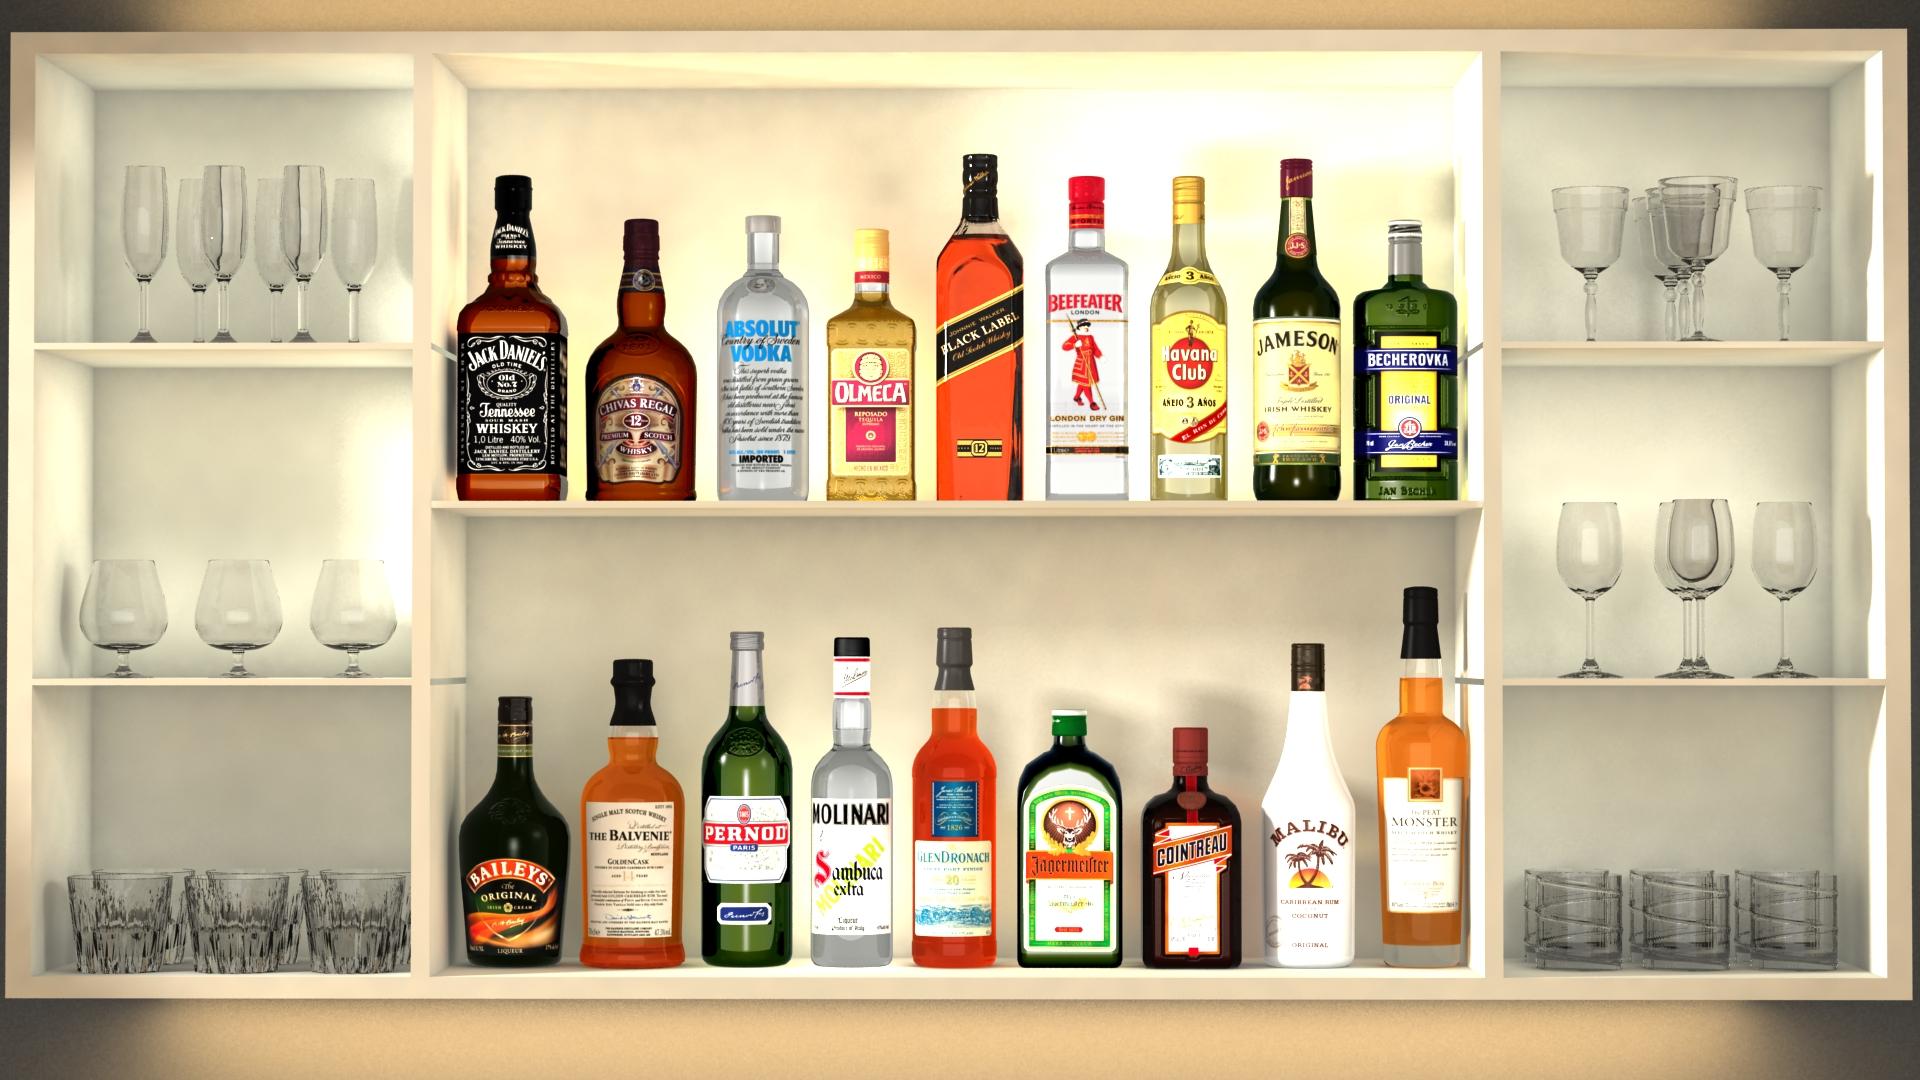 liquor bottles with bar unit interior vr/ar ready 3d model 3ds max  fbx jpeg jpg texture obj 279236